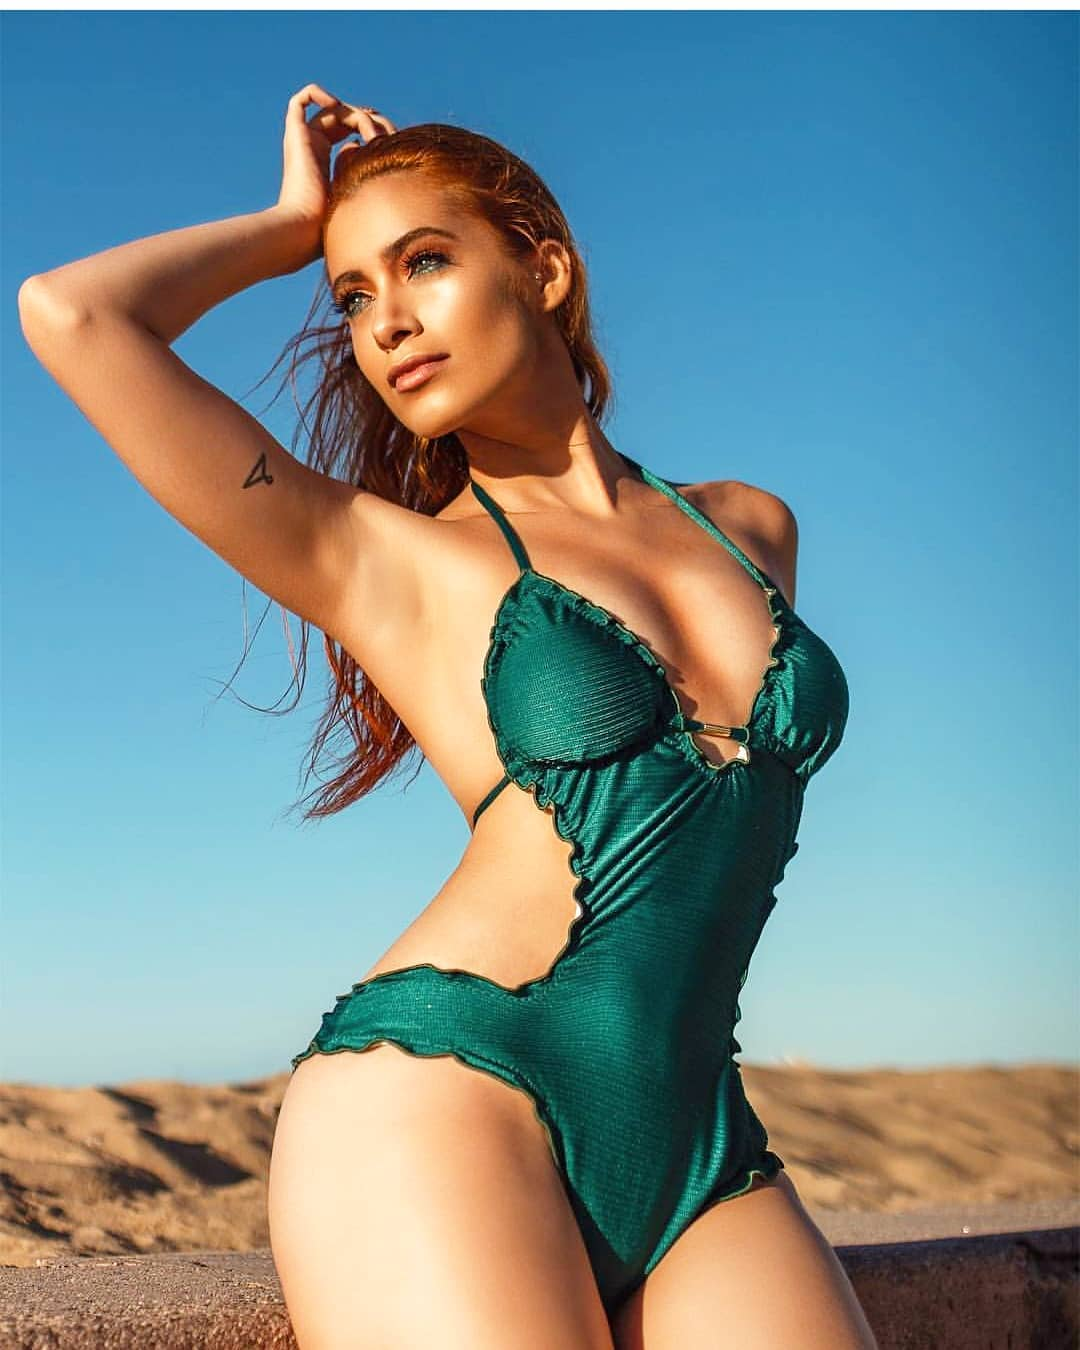 natalia gurgel, top model brasil 2021/miss morada nova 2019/miss sertao central empresarial 2018/top 20 de miss asia pacific international 2018, representando o uruguai. 34461810